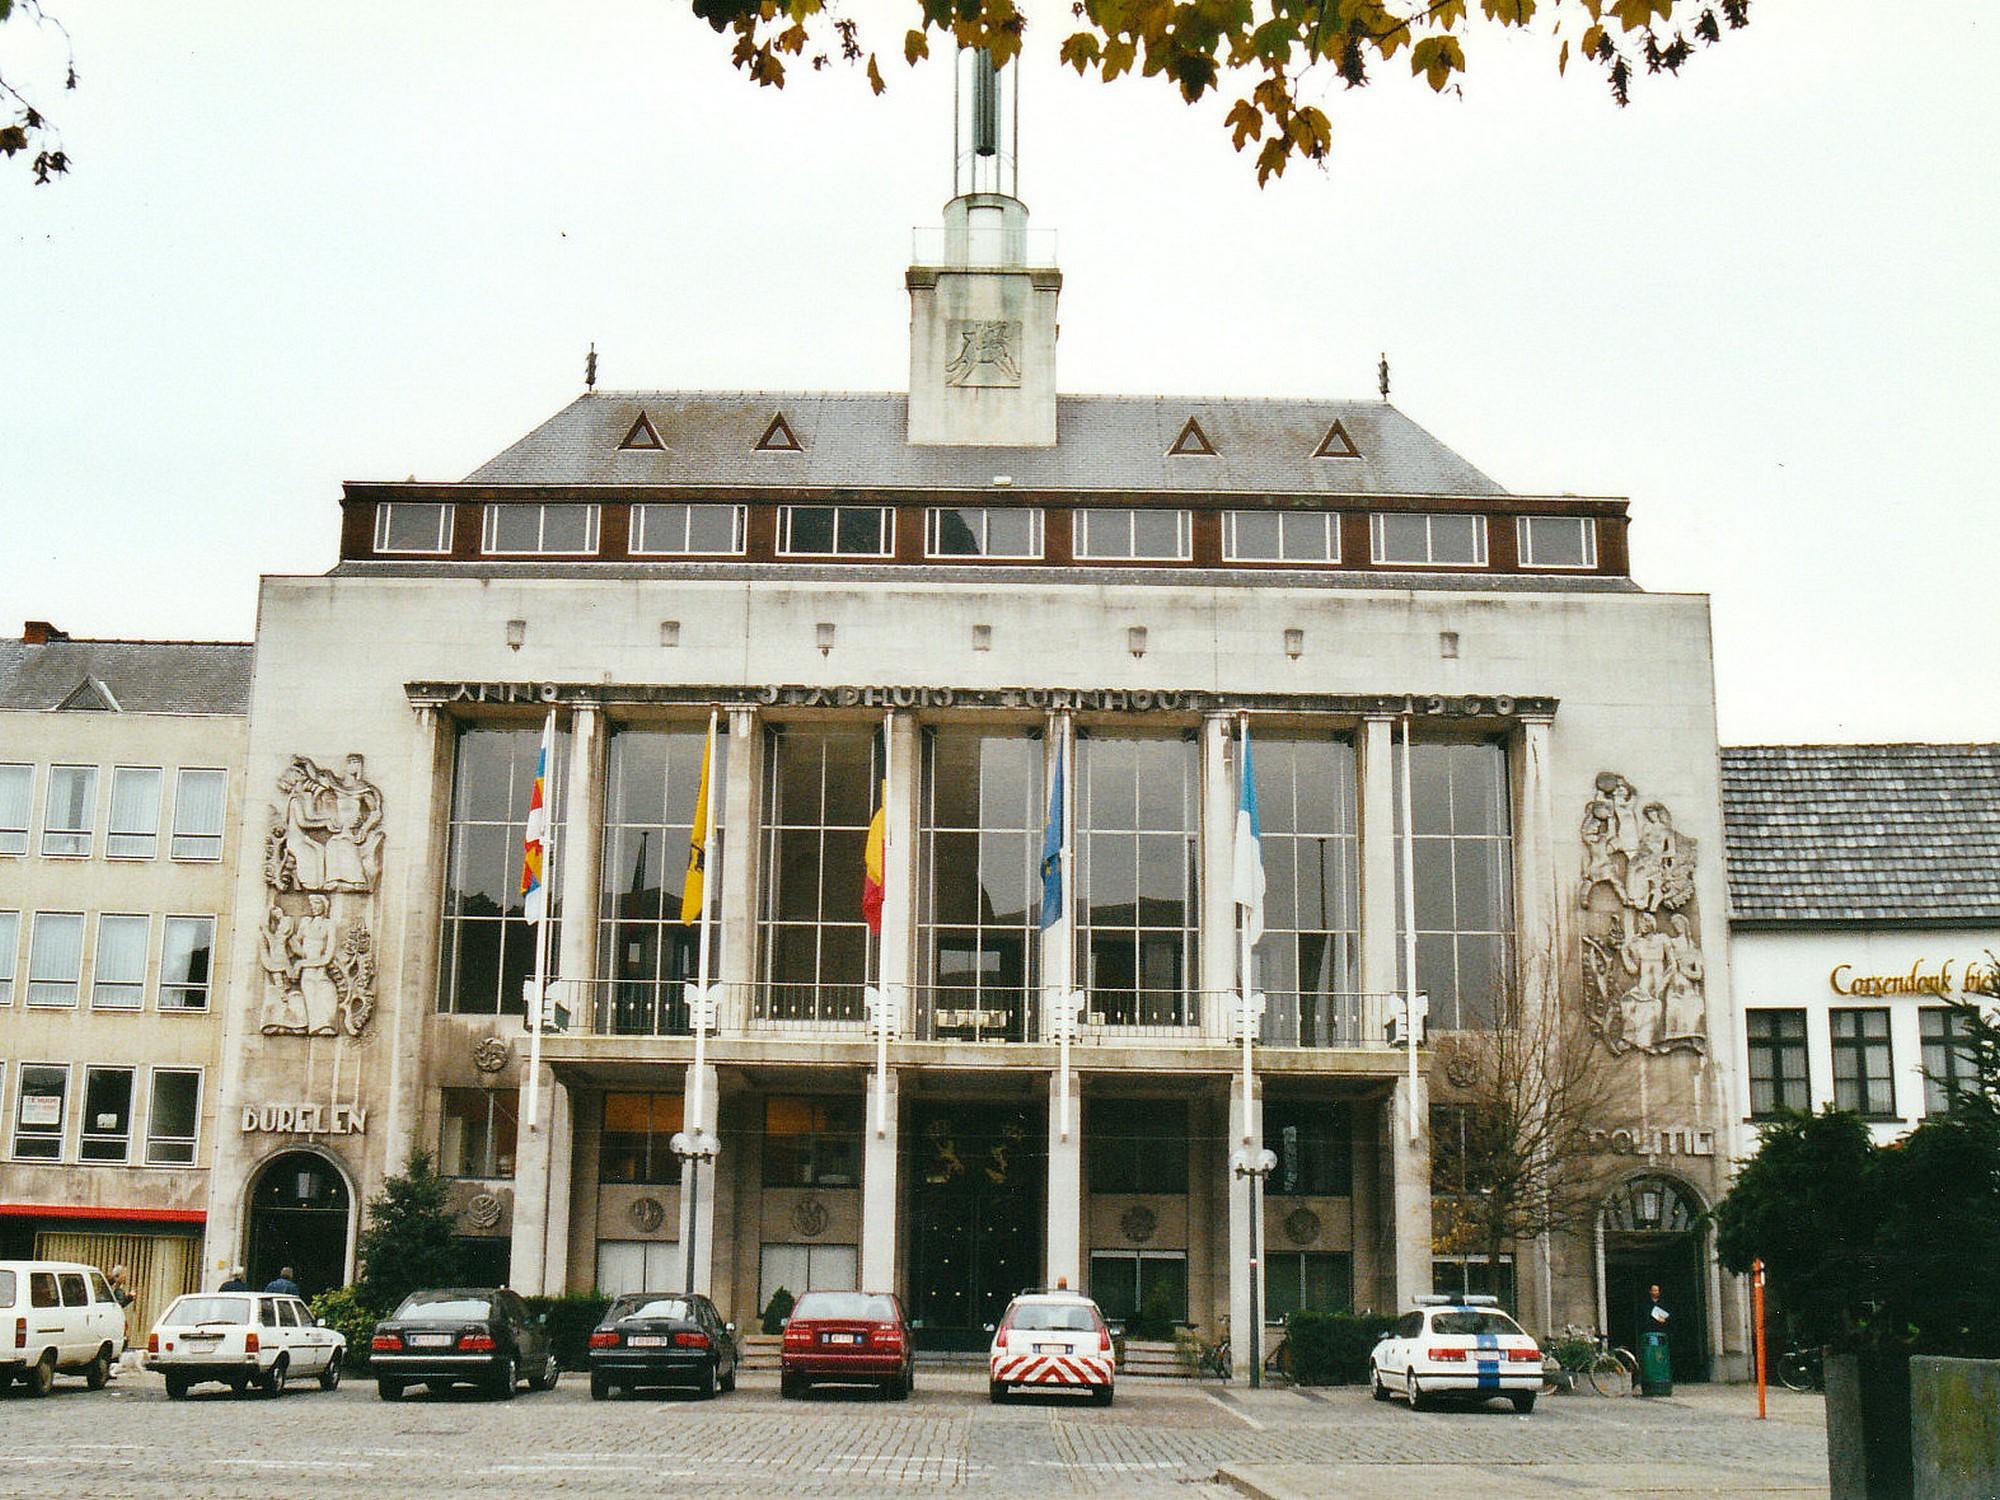 Stadhuis van Turnhout Grote Markt 1 Turnhout | Alexis Dumont